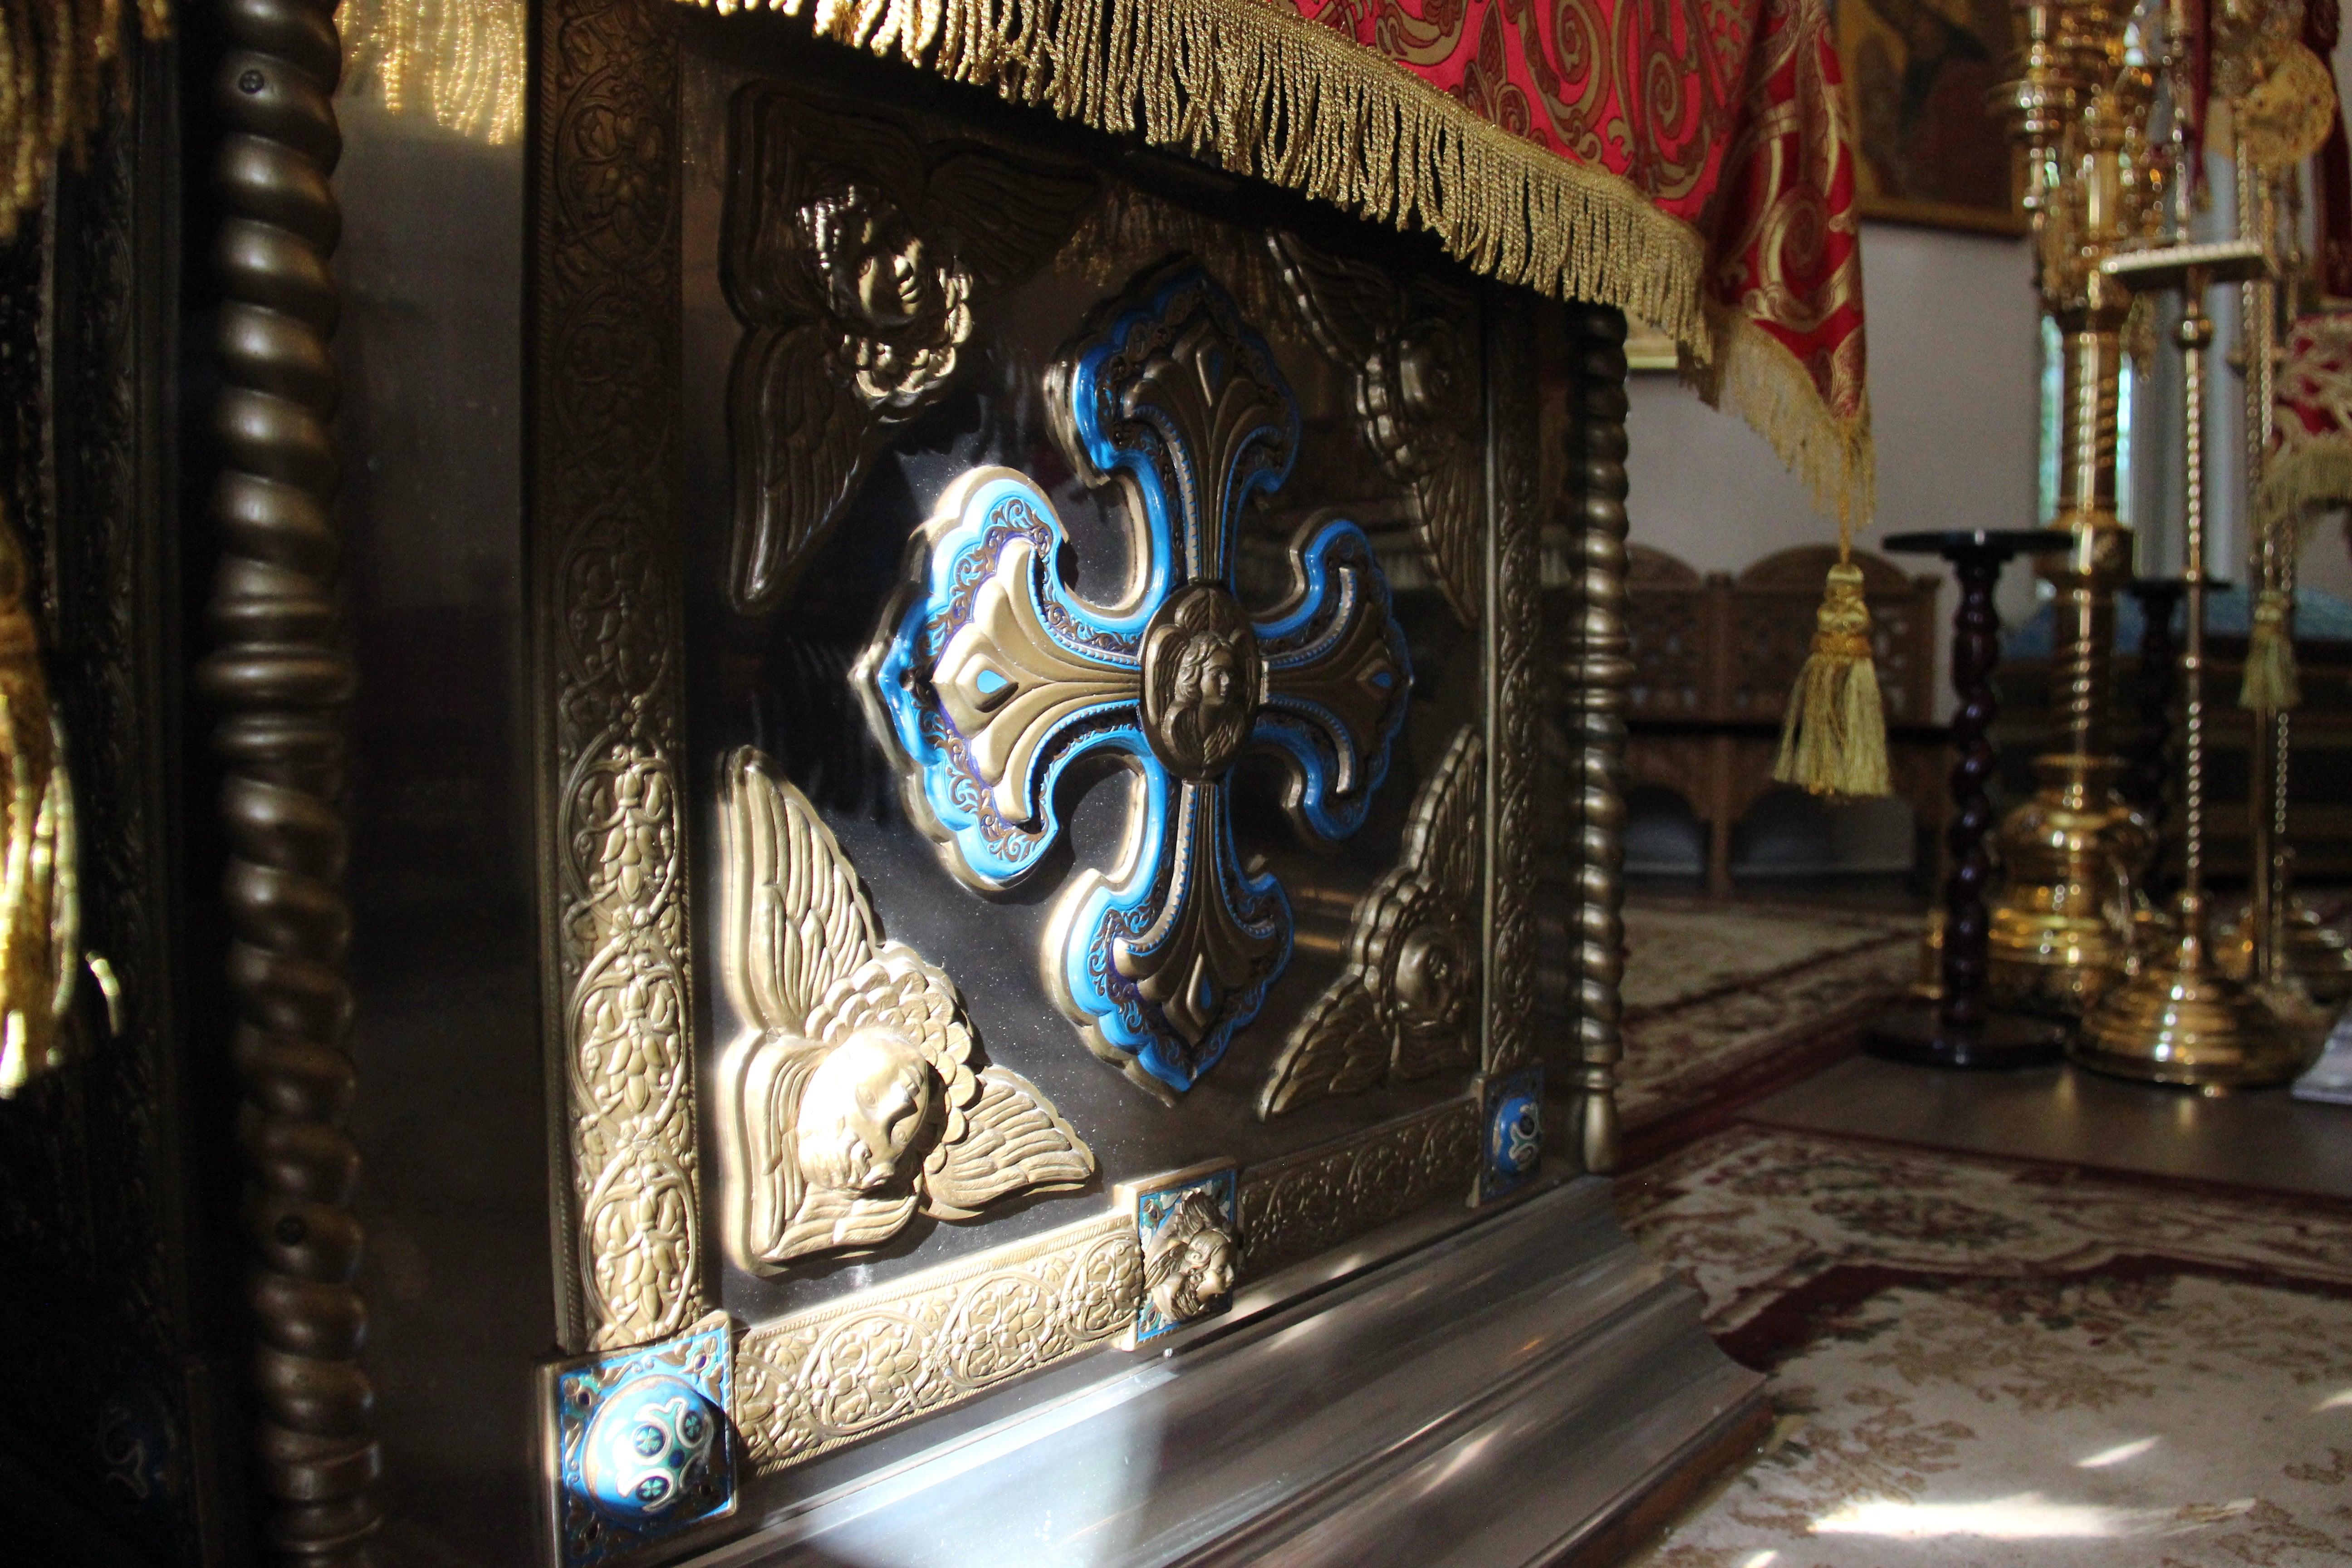 http://monuspen.ru/photoreports/f0fd1d8b1ea6bf9e46e234a1b58ab419.JPG